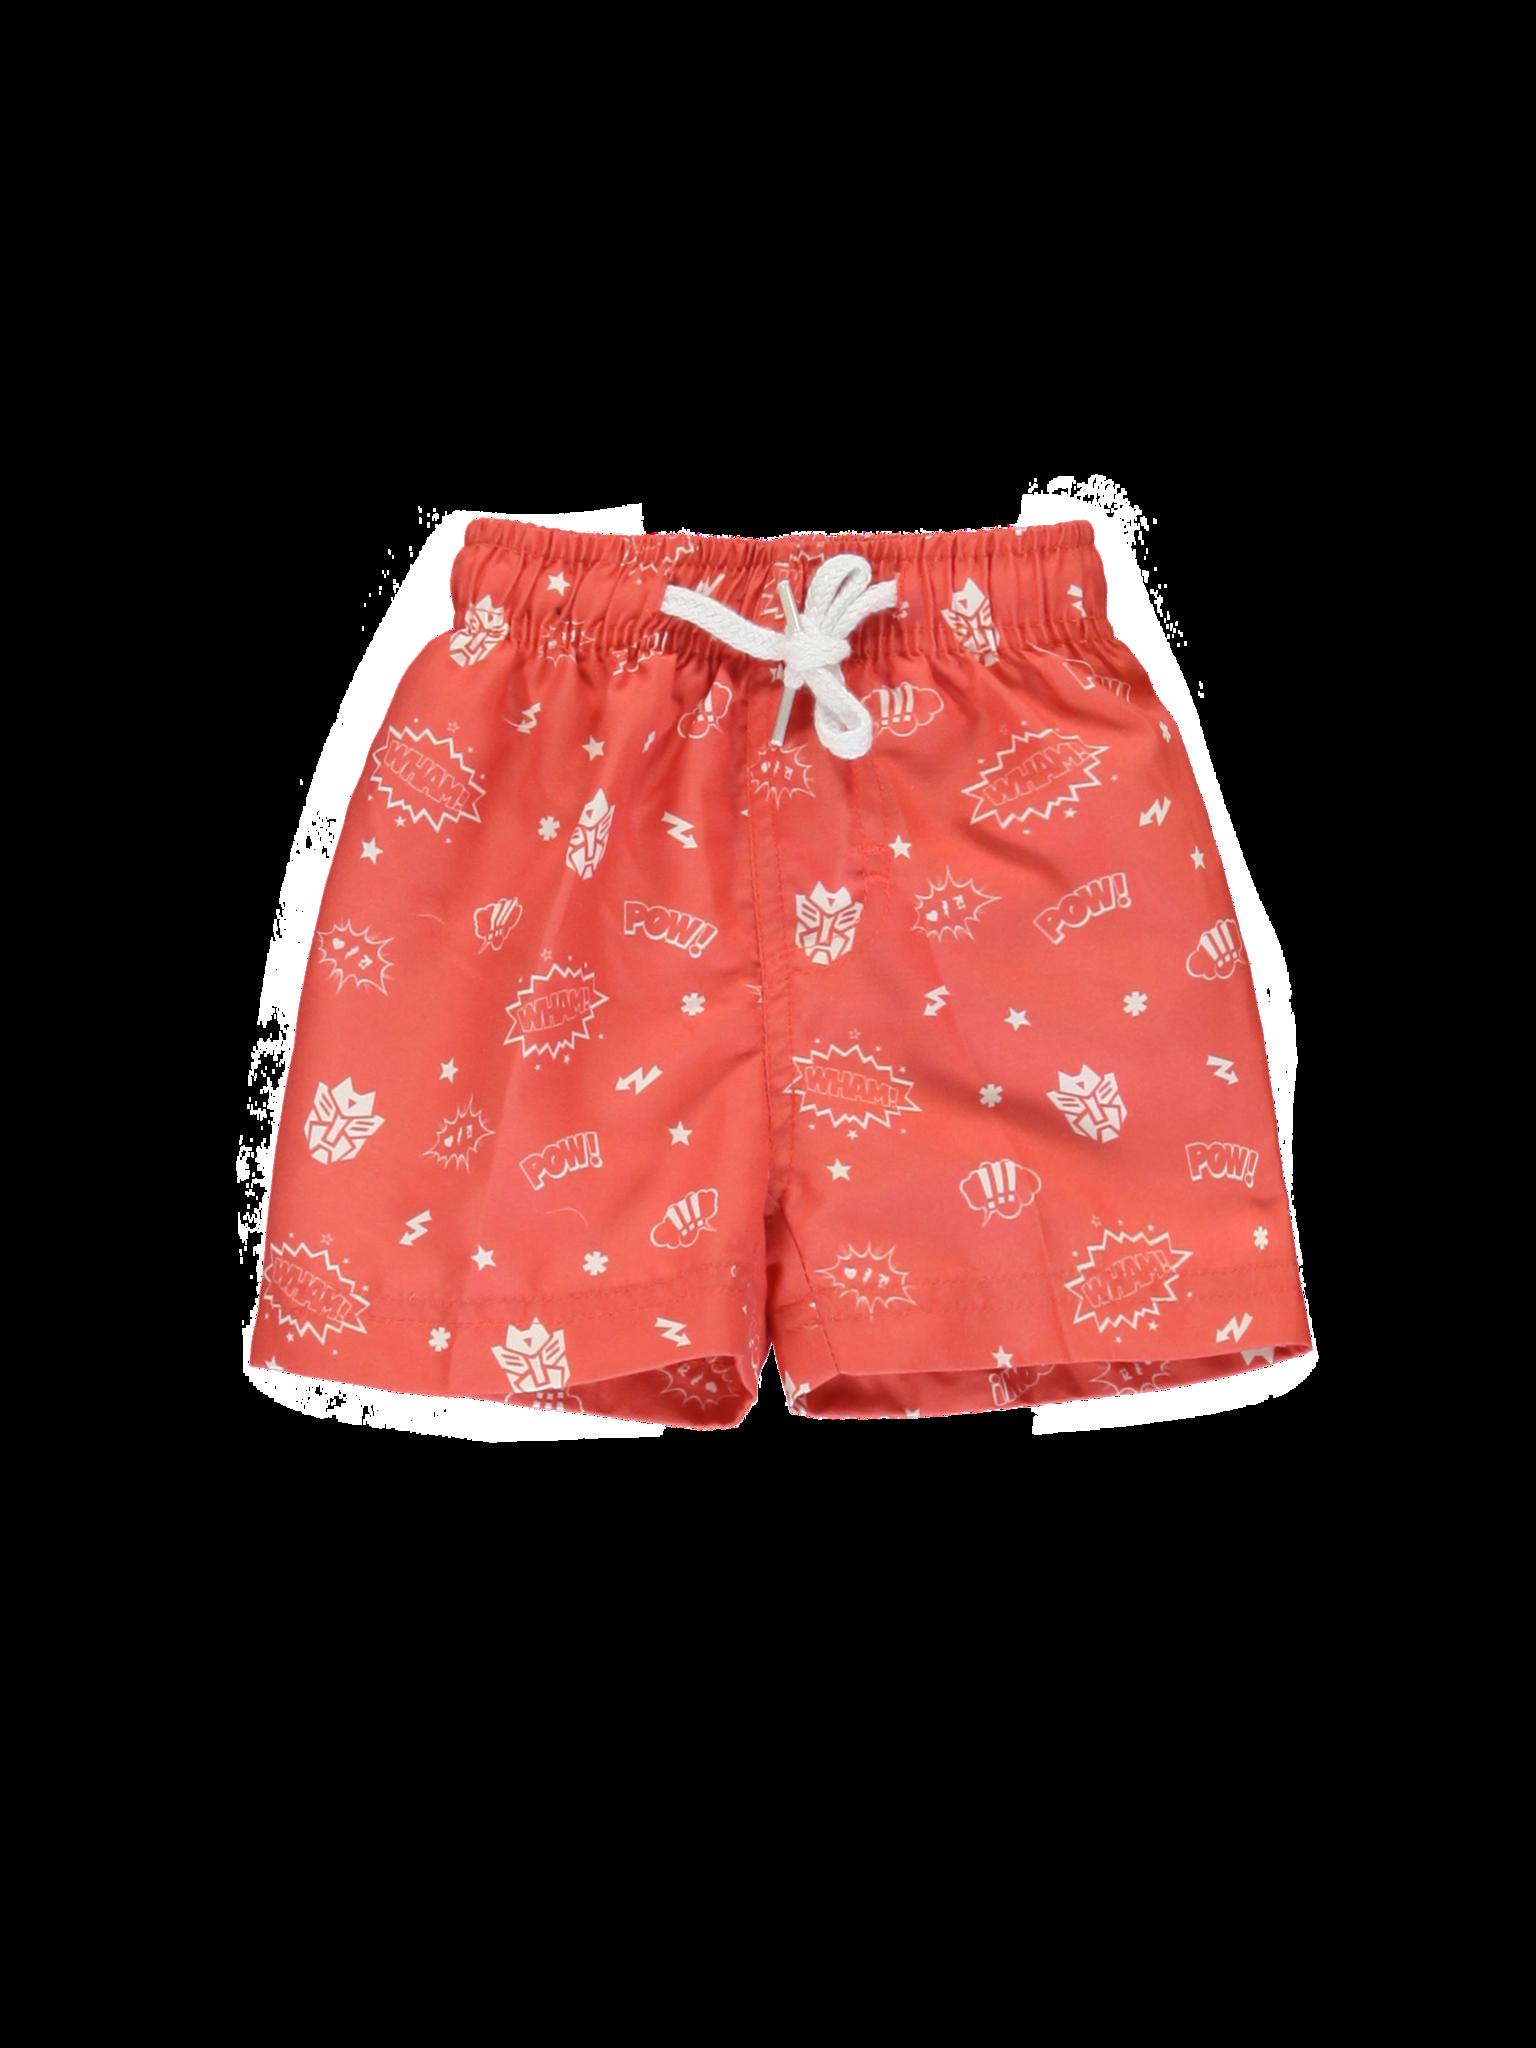 All Brands | Summerproducts Baby | Swimwear | 12 pcs/box